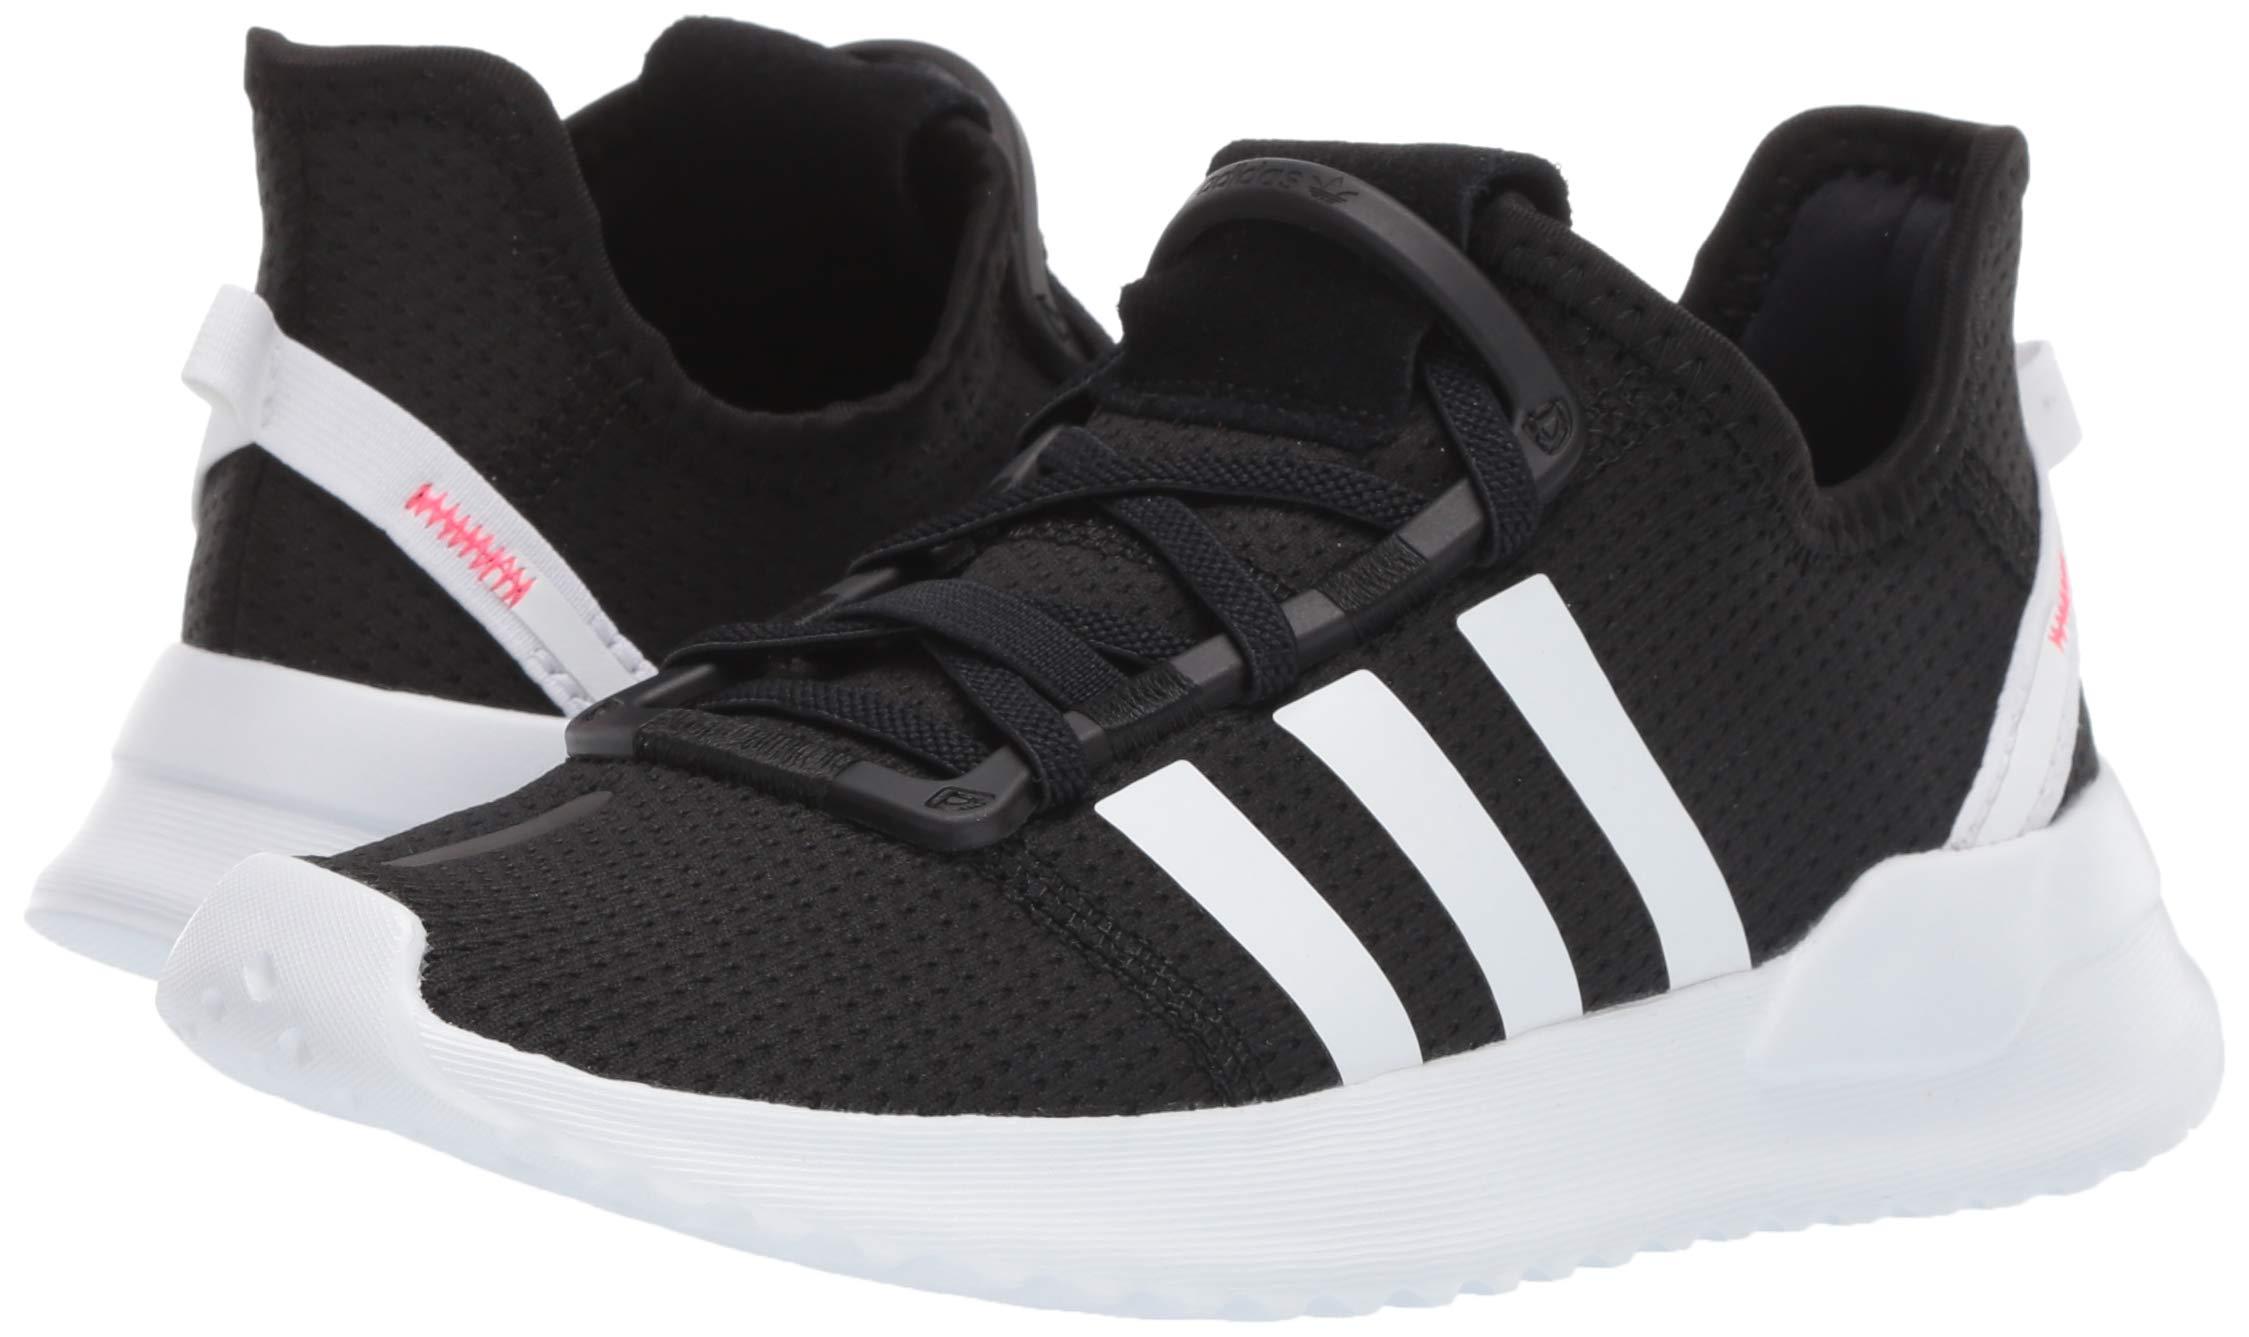 adidas Originals Baby U_Path Running Shoe Black/White/Shock red 6K M US Toddler by adidas Originals (Image #6)